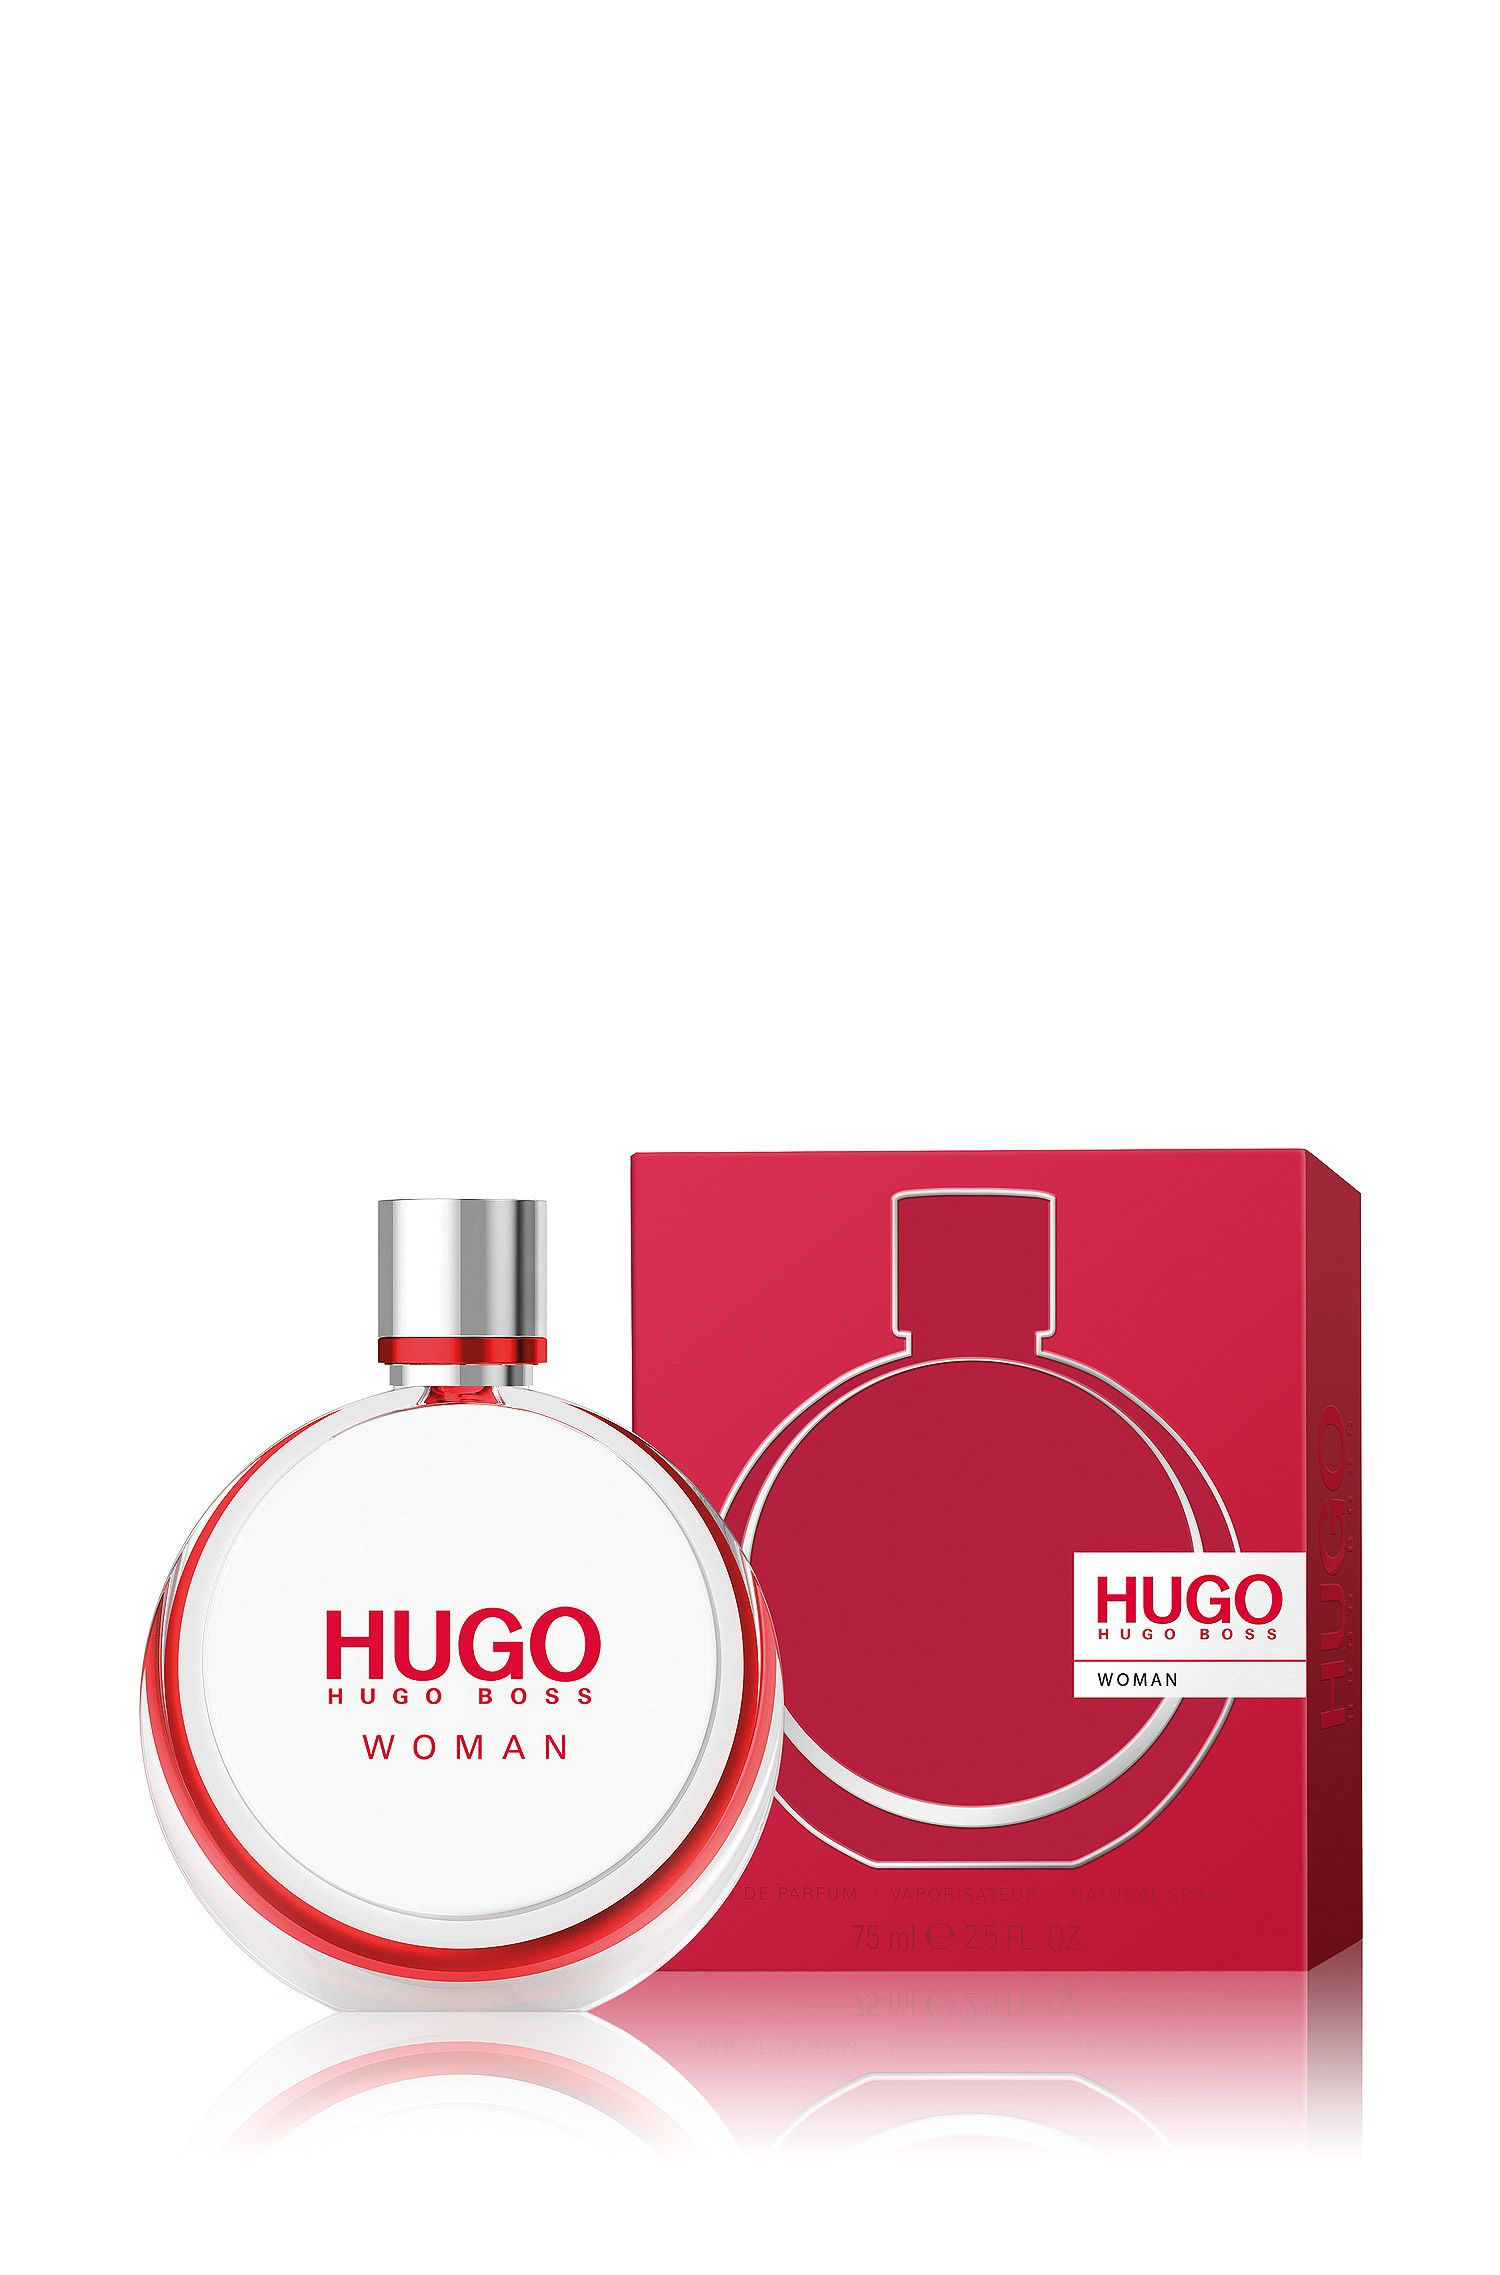 'HUGO Woman' | 2.5 oz (75 mL) Eau de Parfum